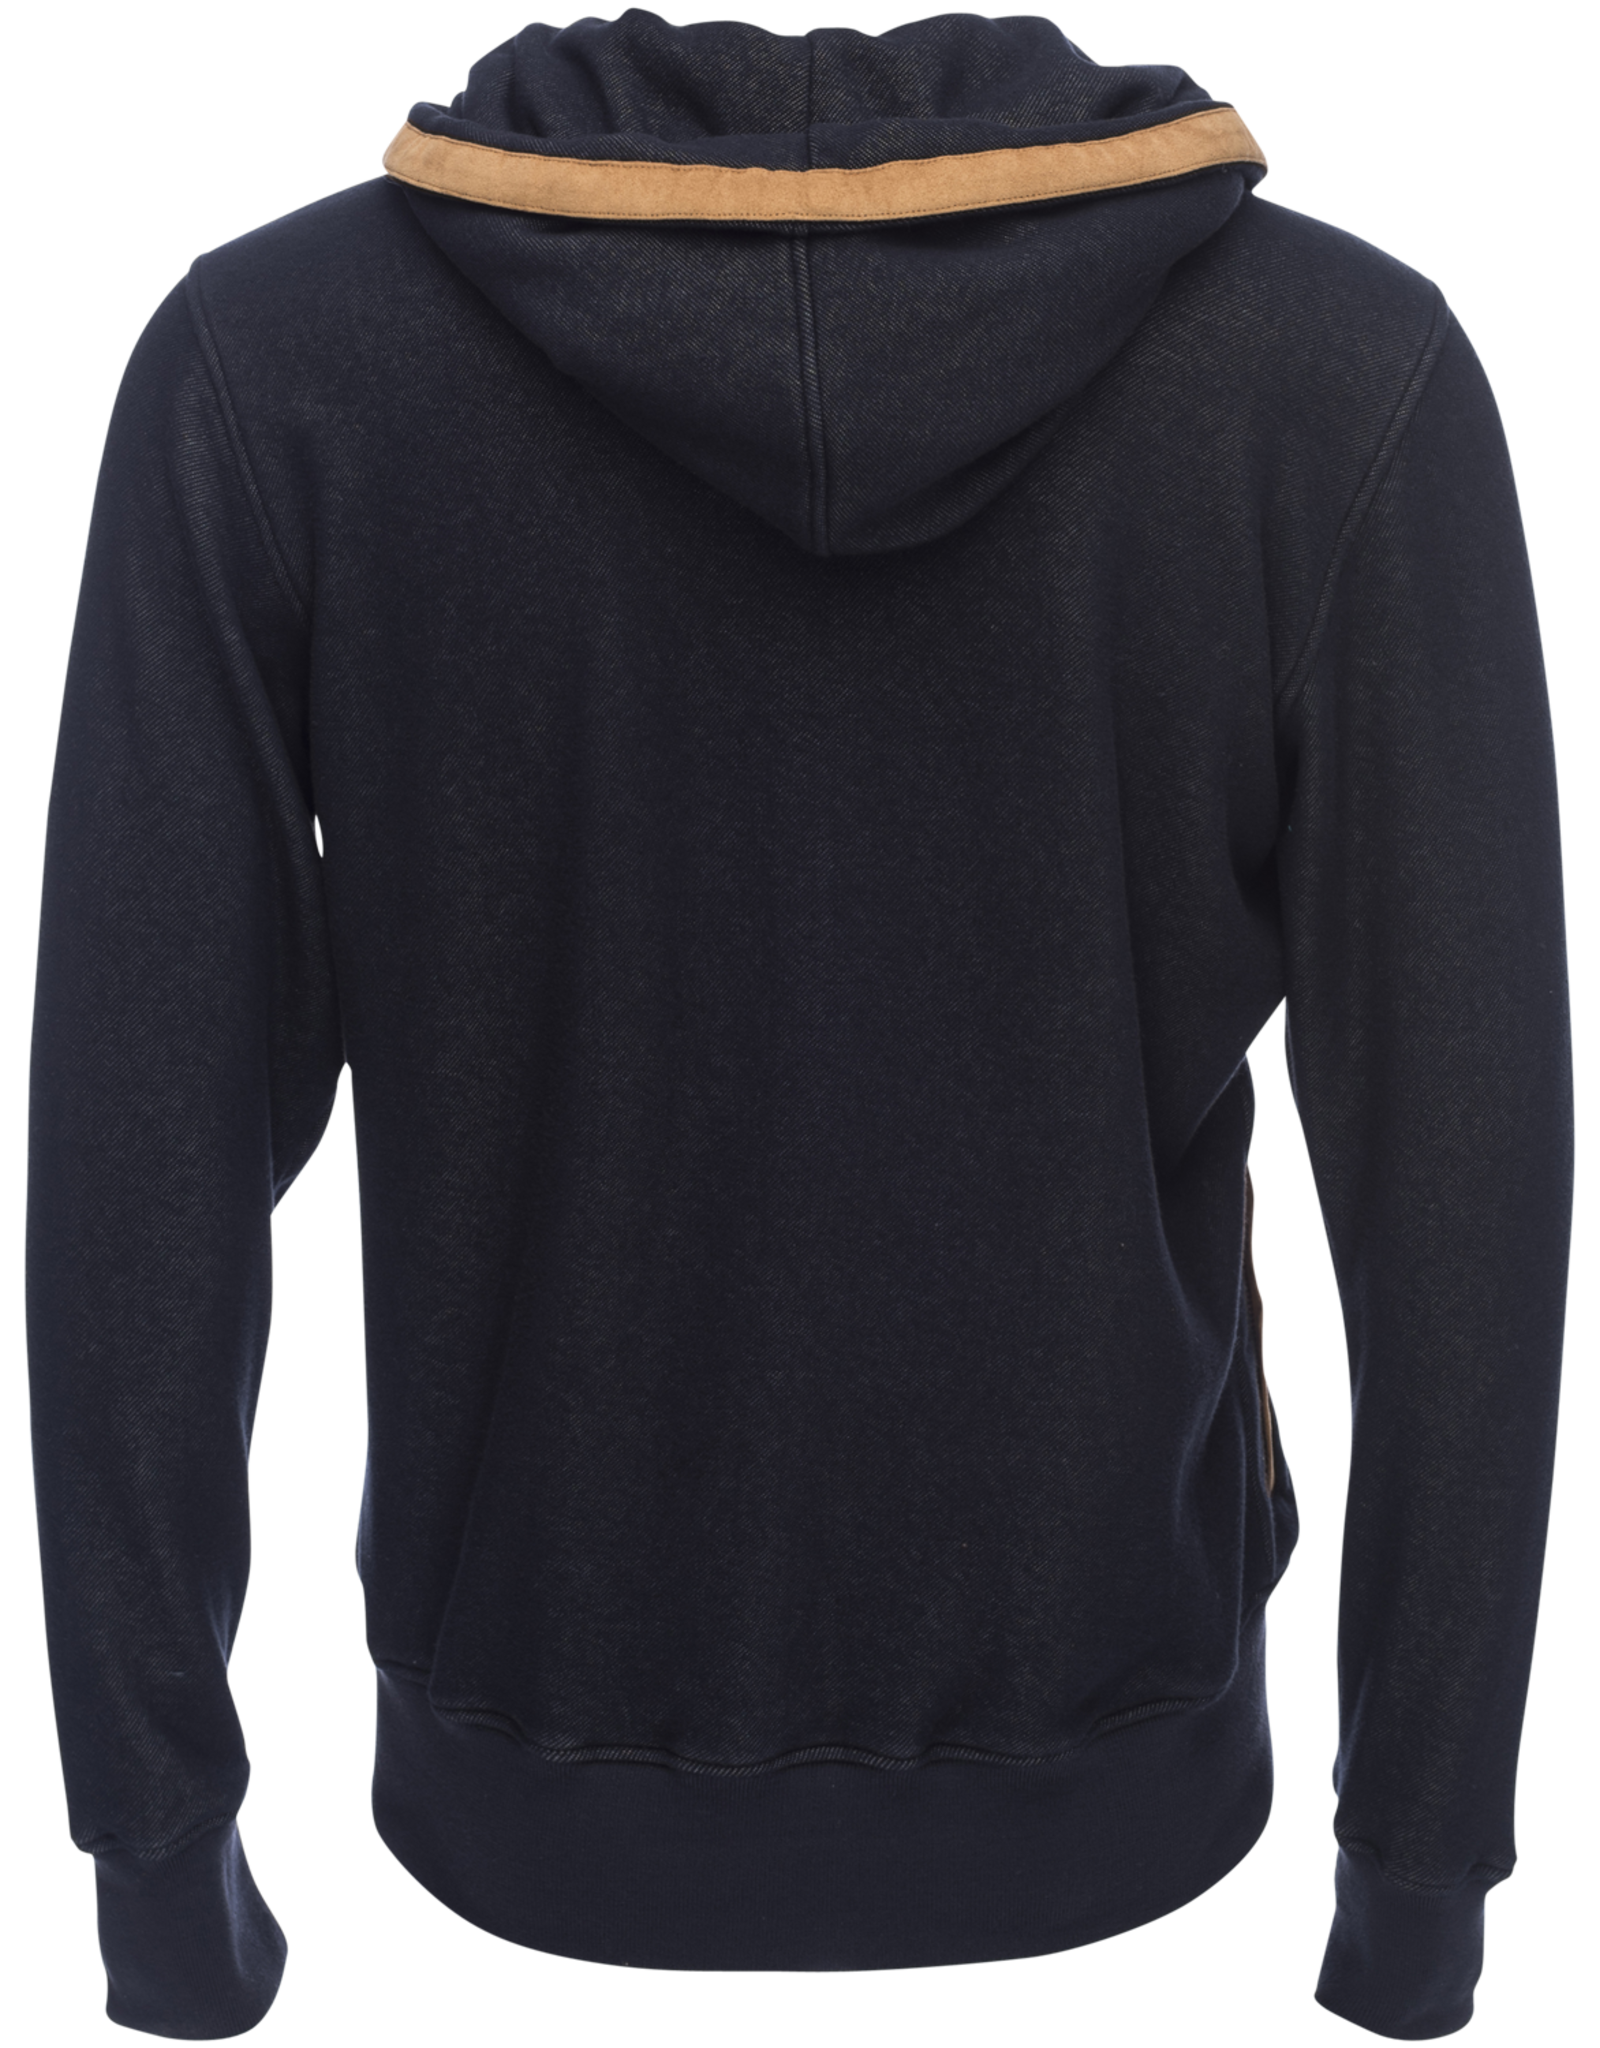 Nifty Genius Cassius Hooded Sweatshirt